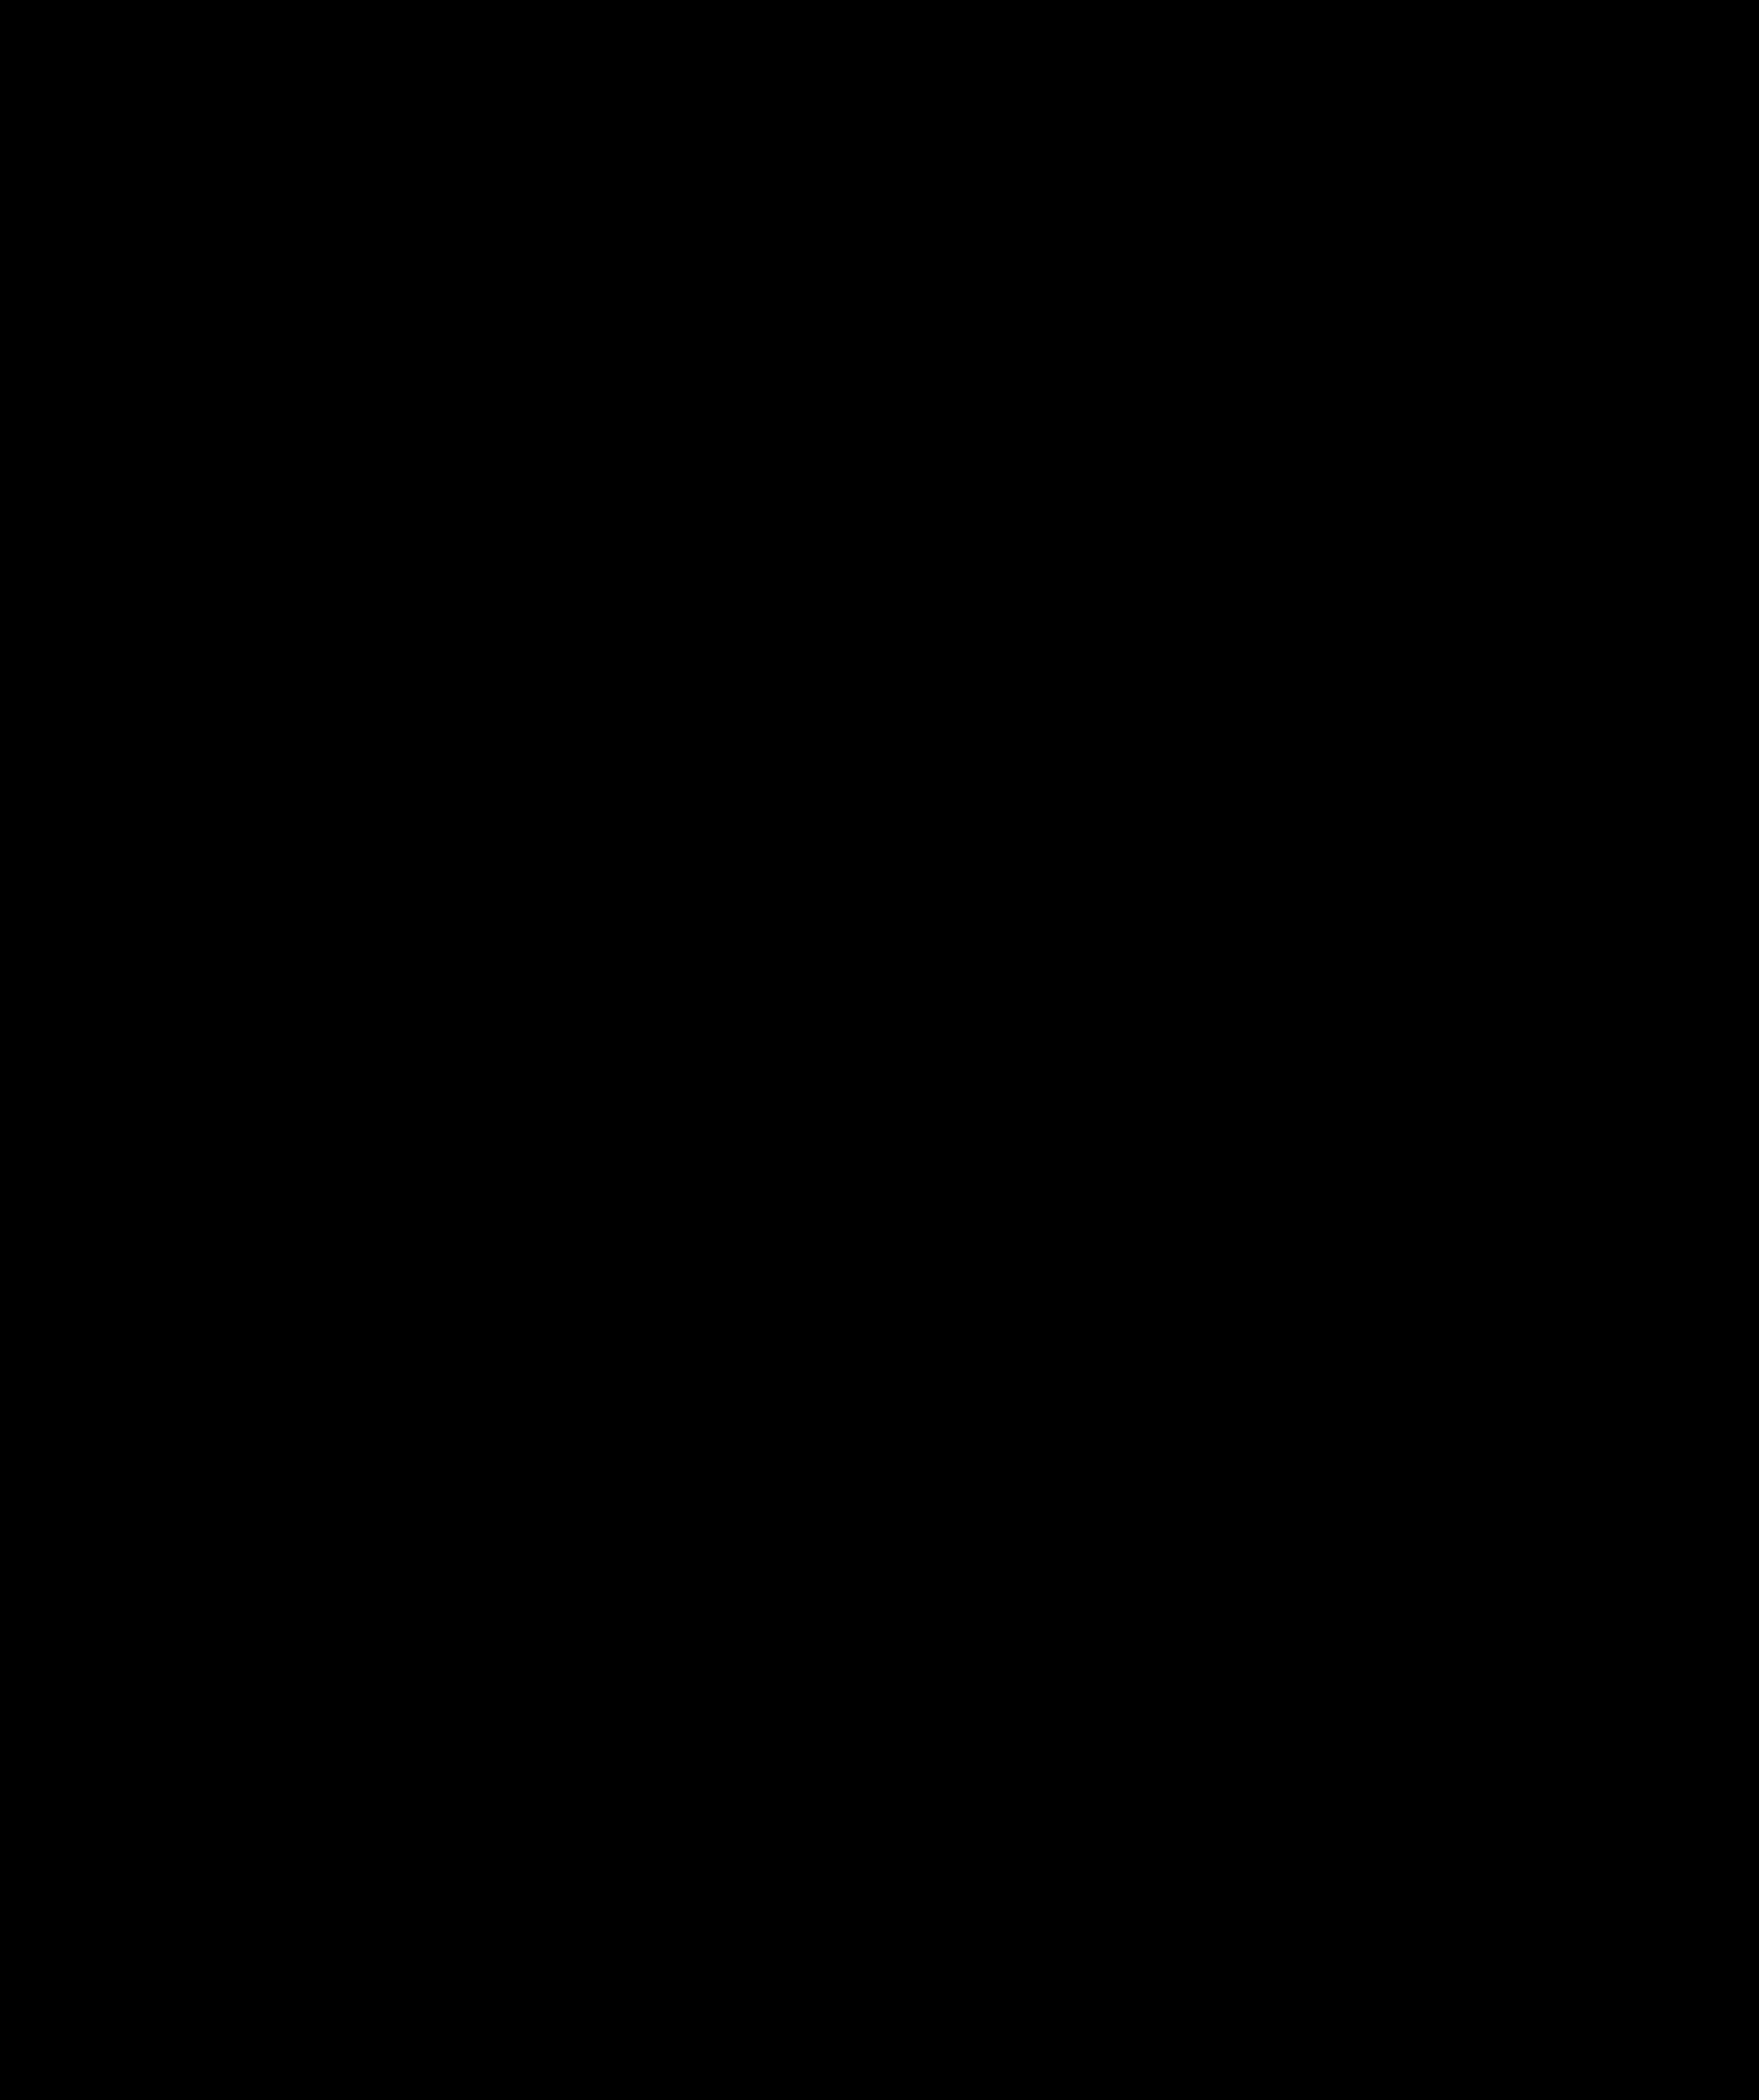 Elliptical Frame Vector Karangan Bunga Hitam Putih Transparent